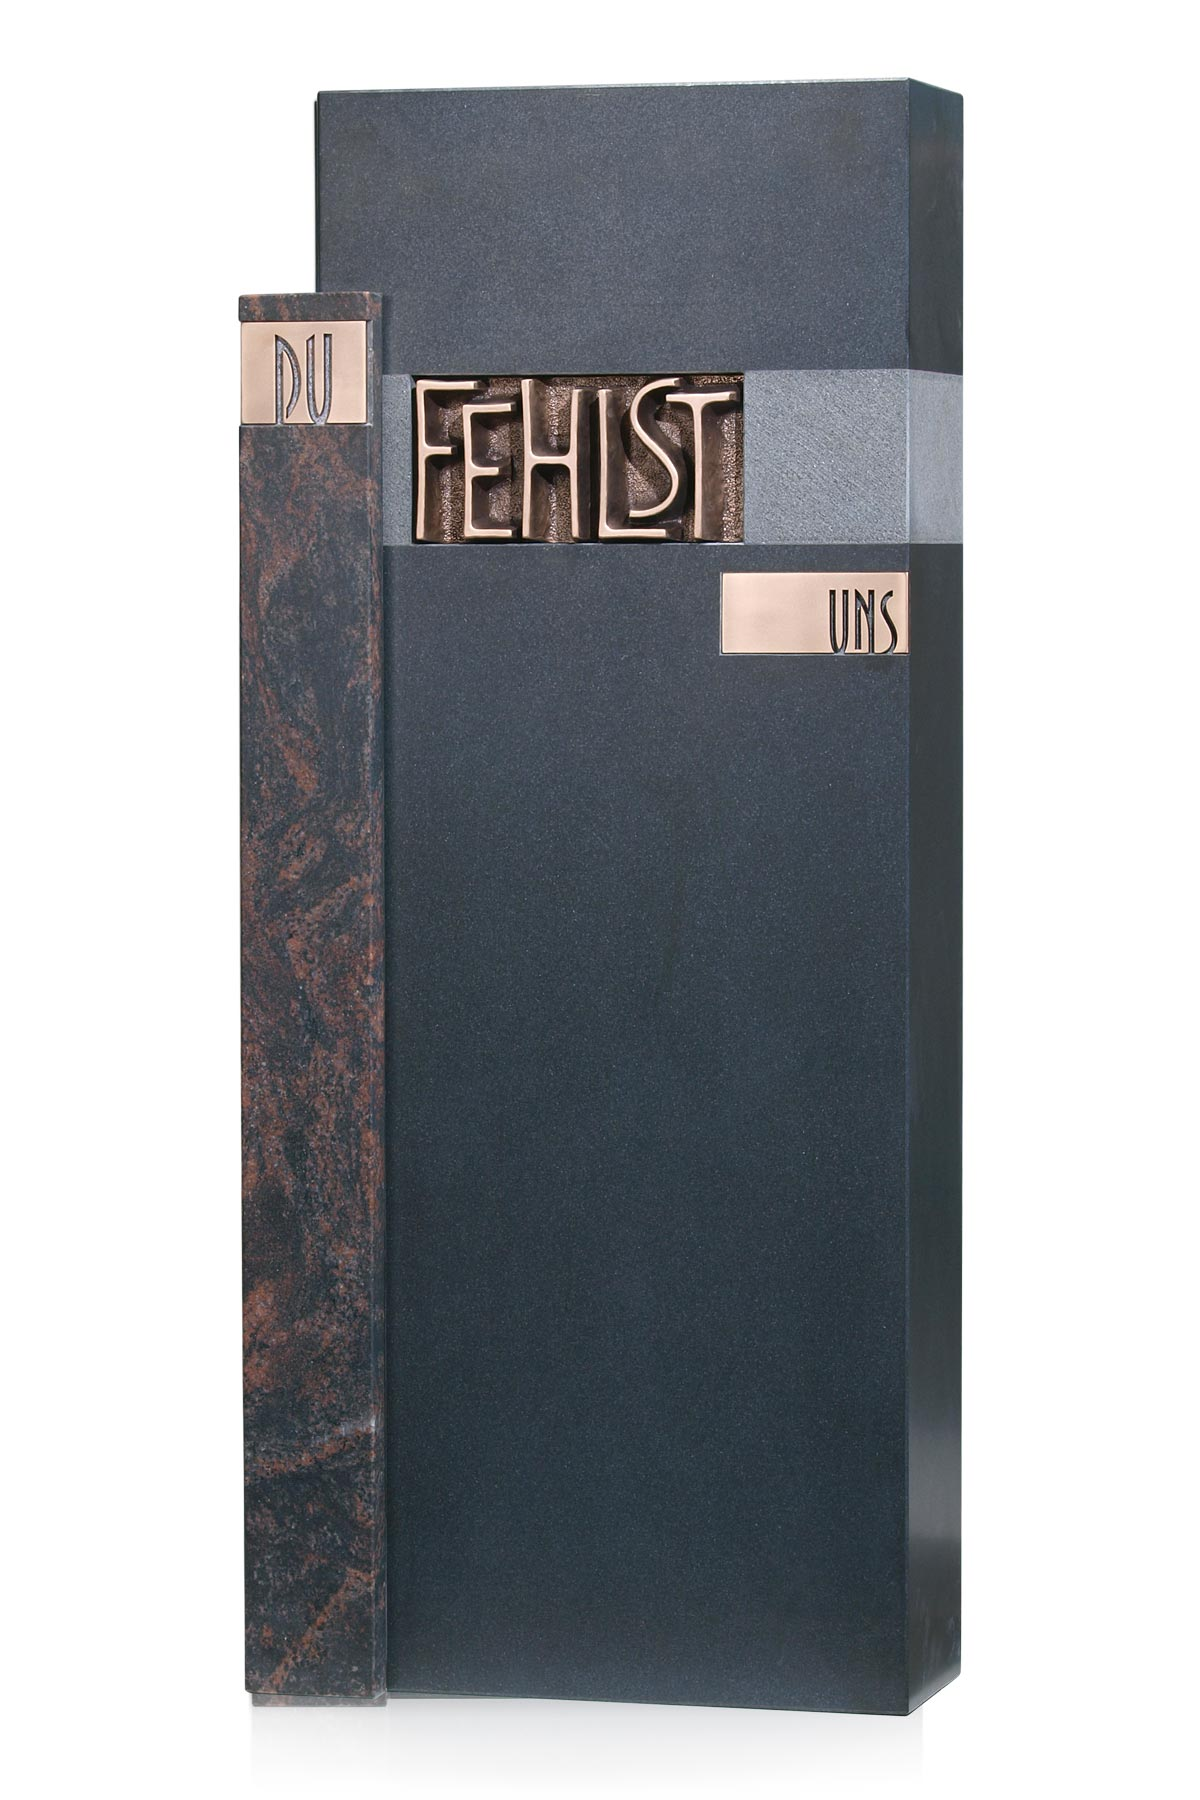 U125 Edition Du Fehlst